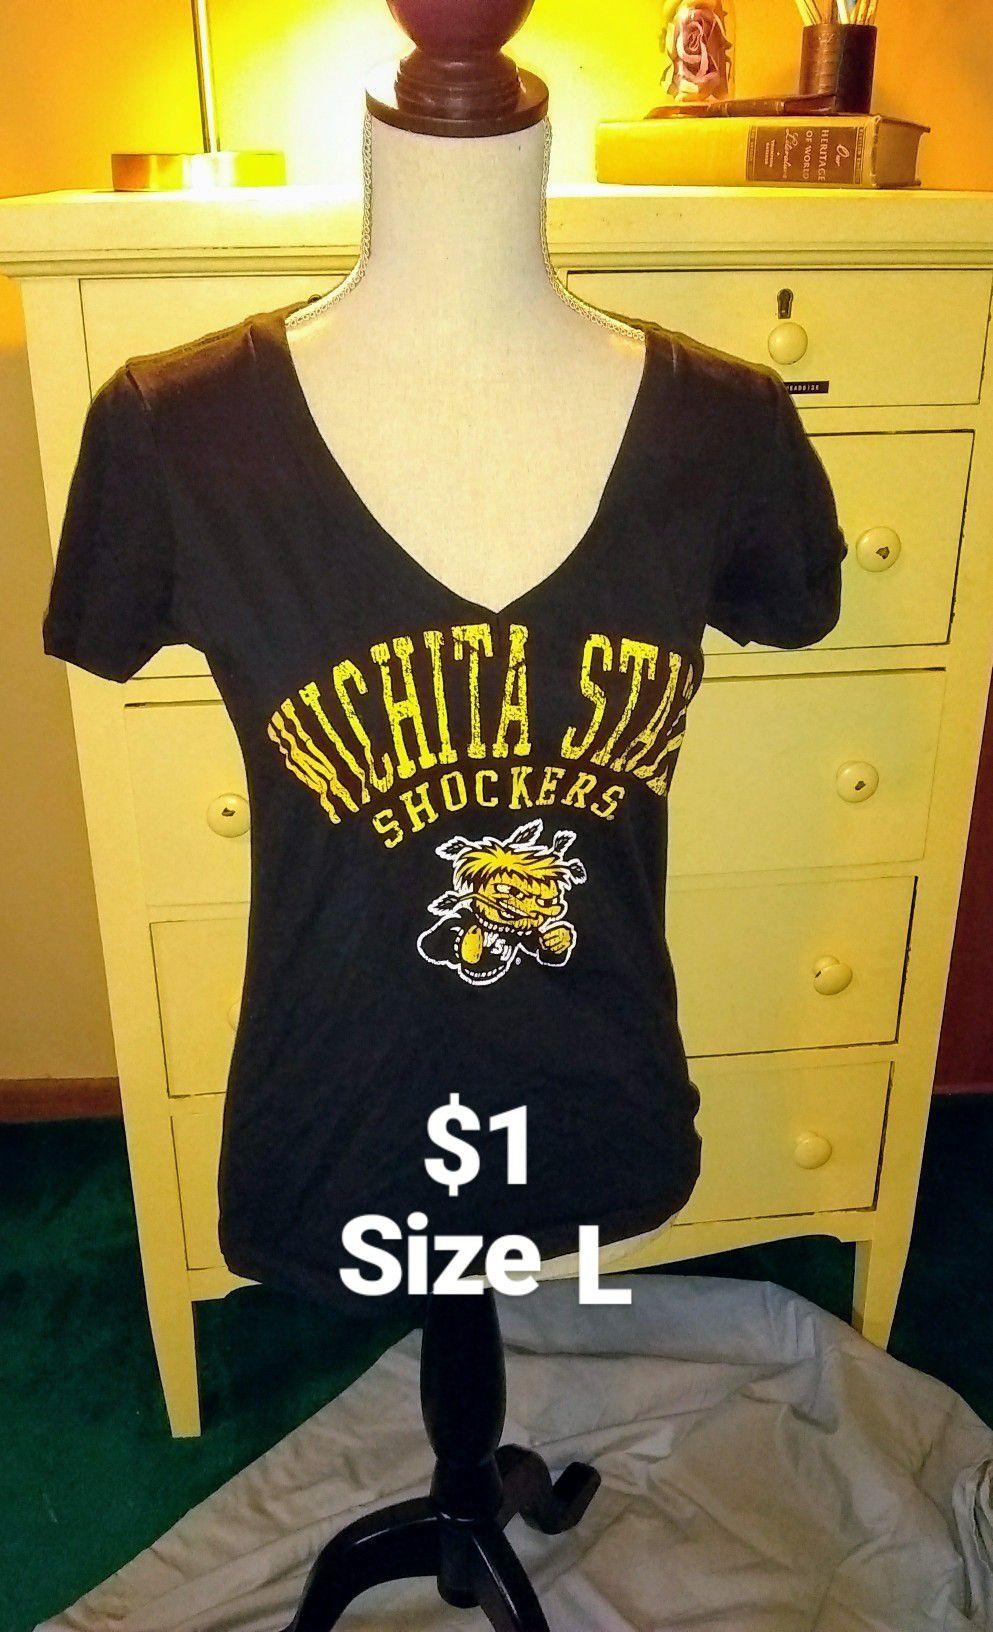 Woman's Large T-shirt